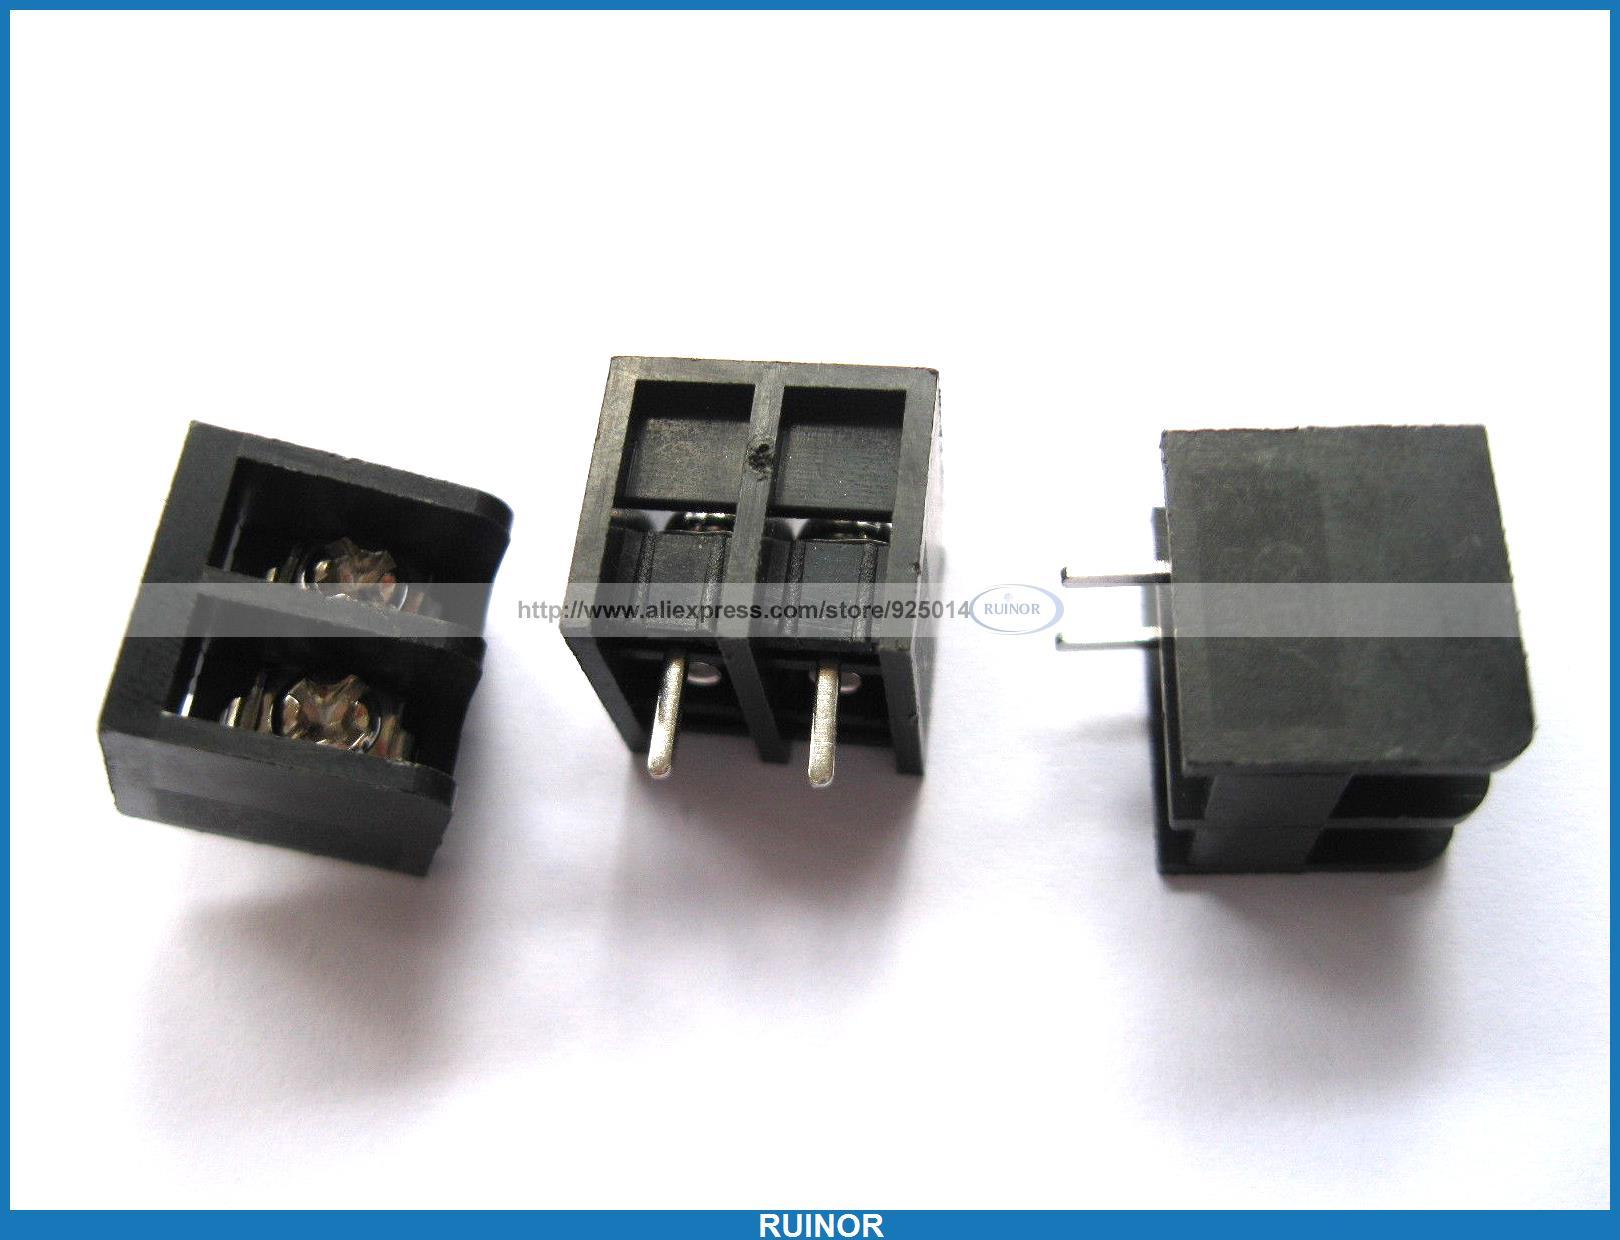 250 Pcs Black 2 Pin 8 25mm Screw Terminal Block Connector Barrier Type DC39B матрас roll matratze feder 500 p l 90x200